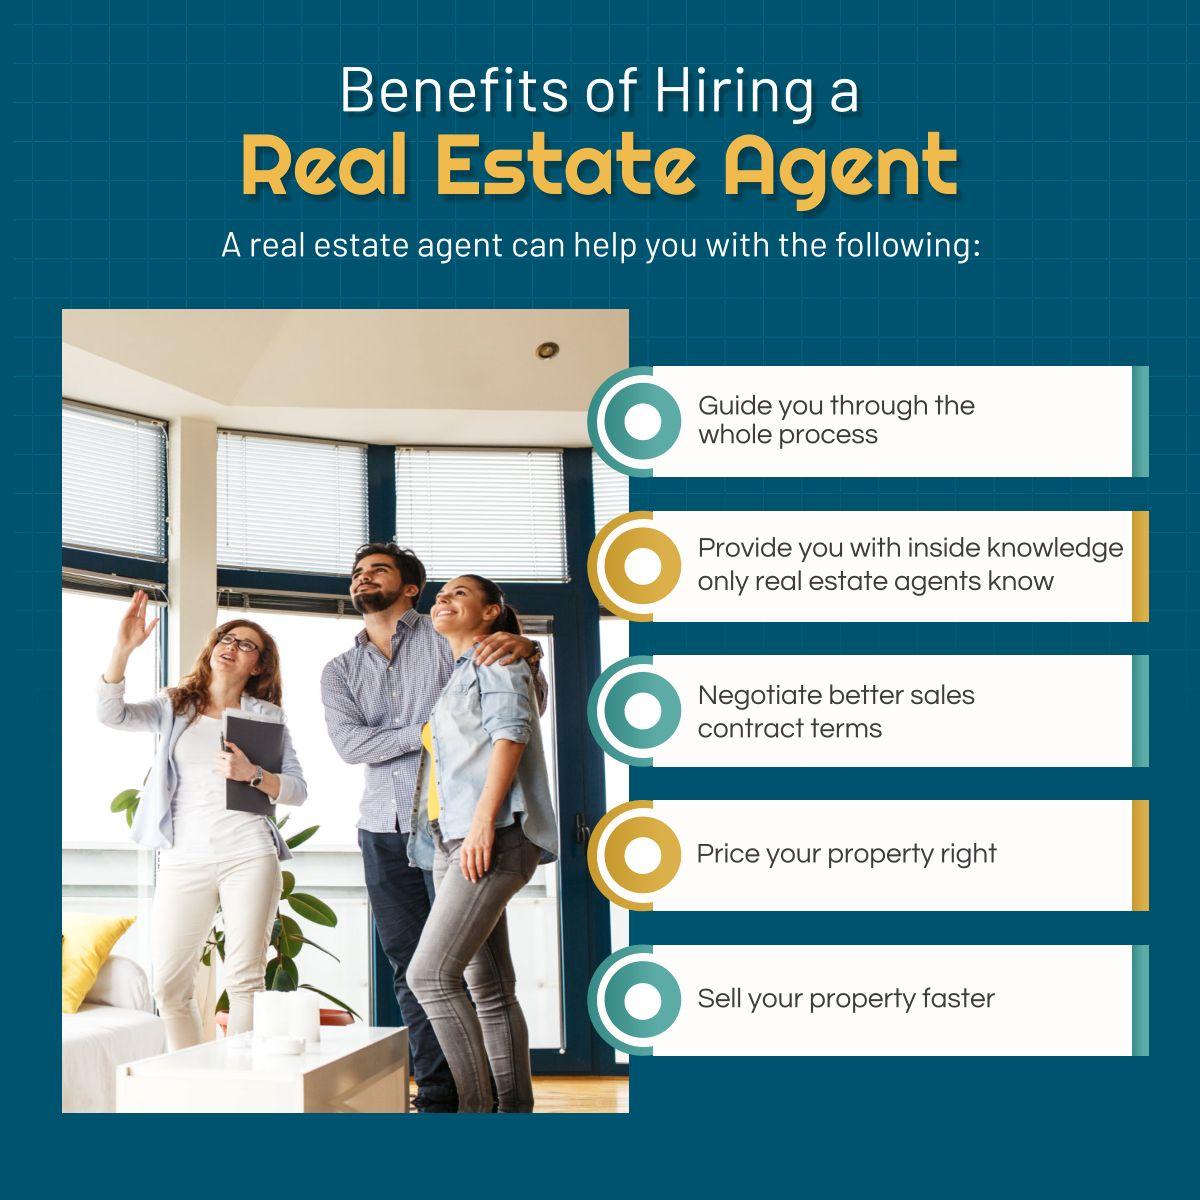 Benefits Of Hiring A Real Estate Agent Vistariverproperties